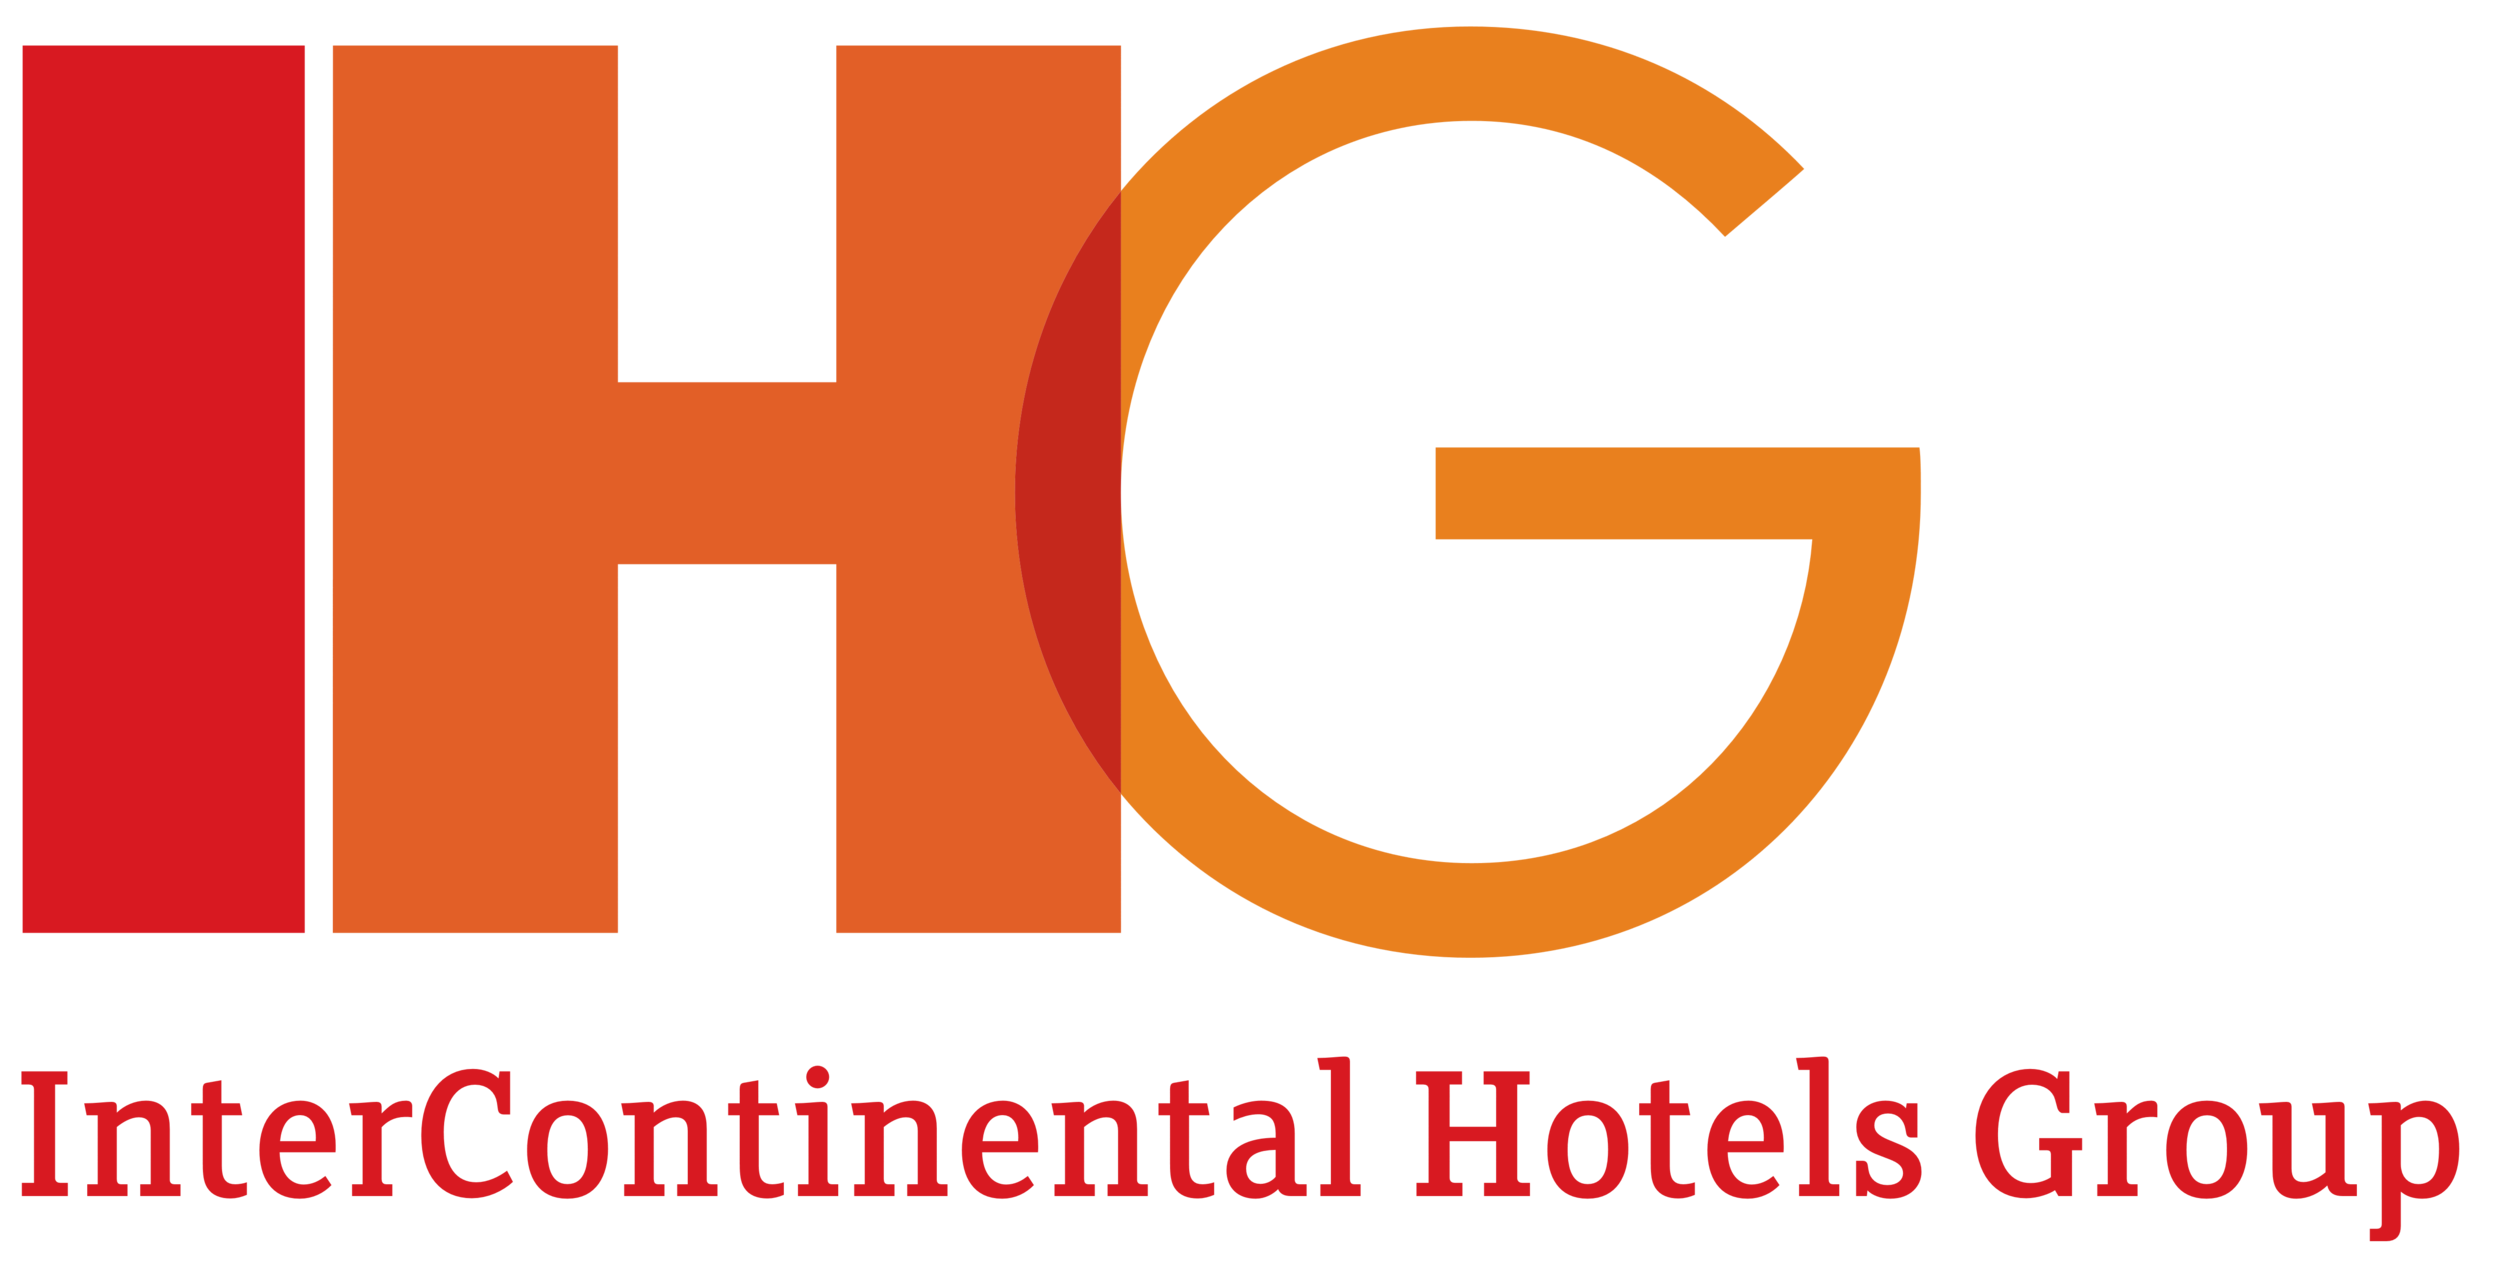 IHG_logo_InterContinental_Hotels_Group.png